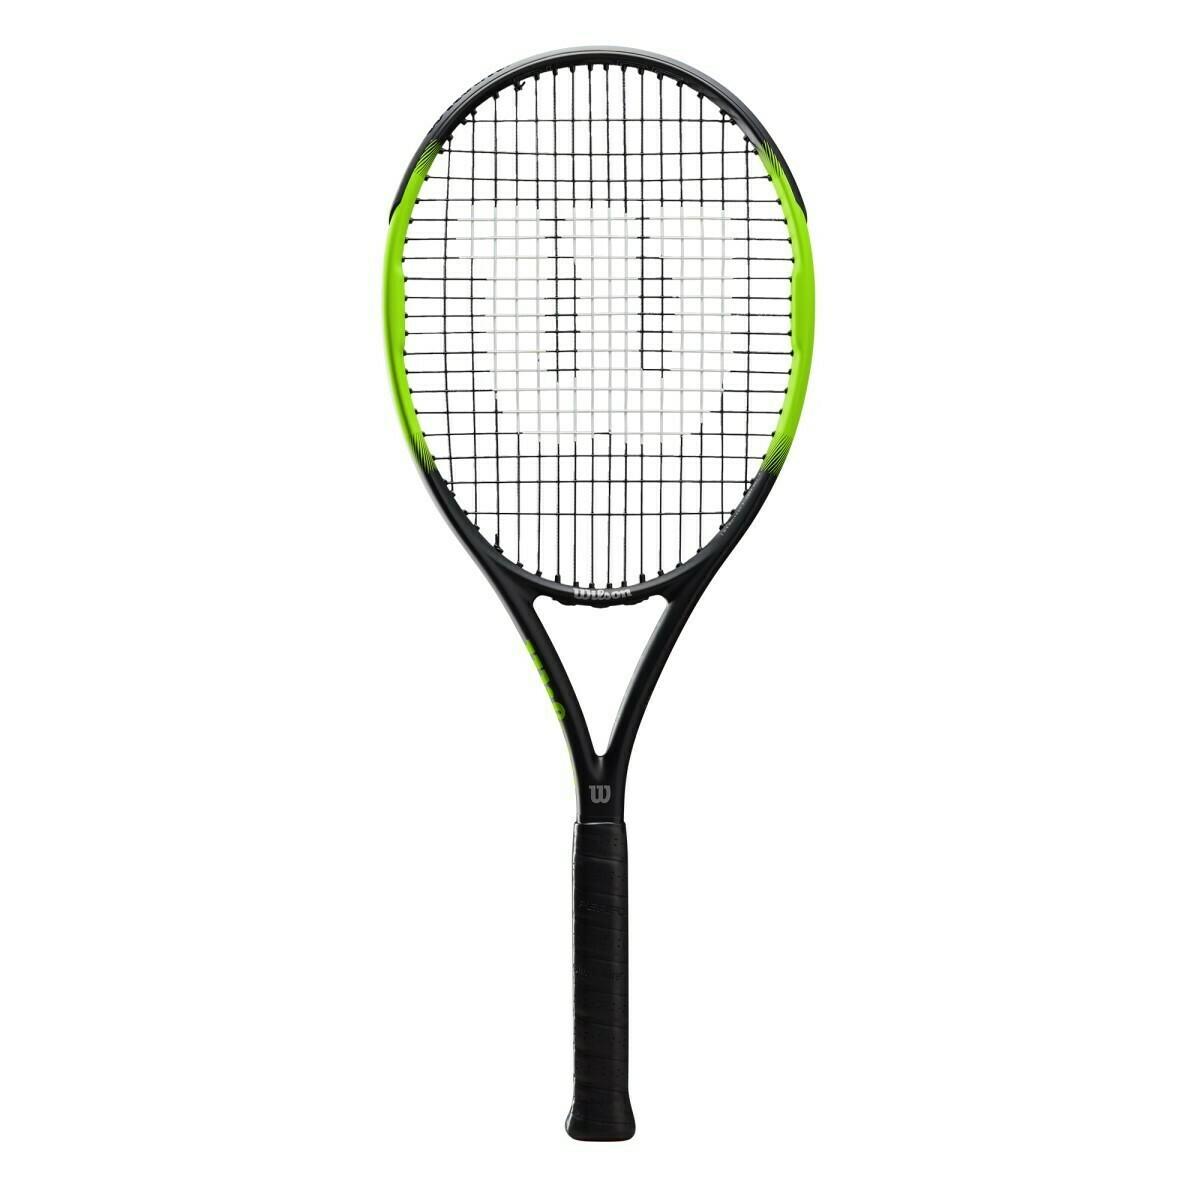 Wilson Blade Feel 105 Tennis Racket - Black/Green